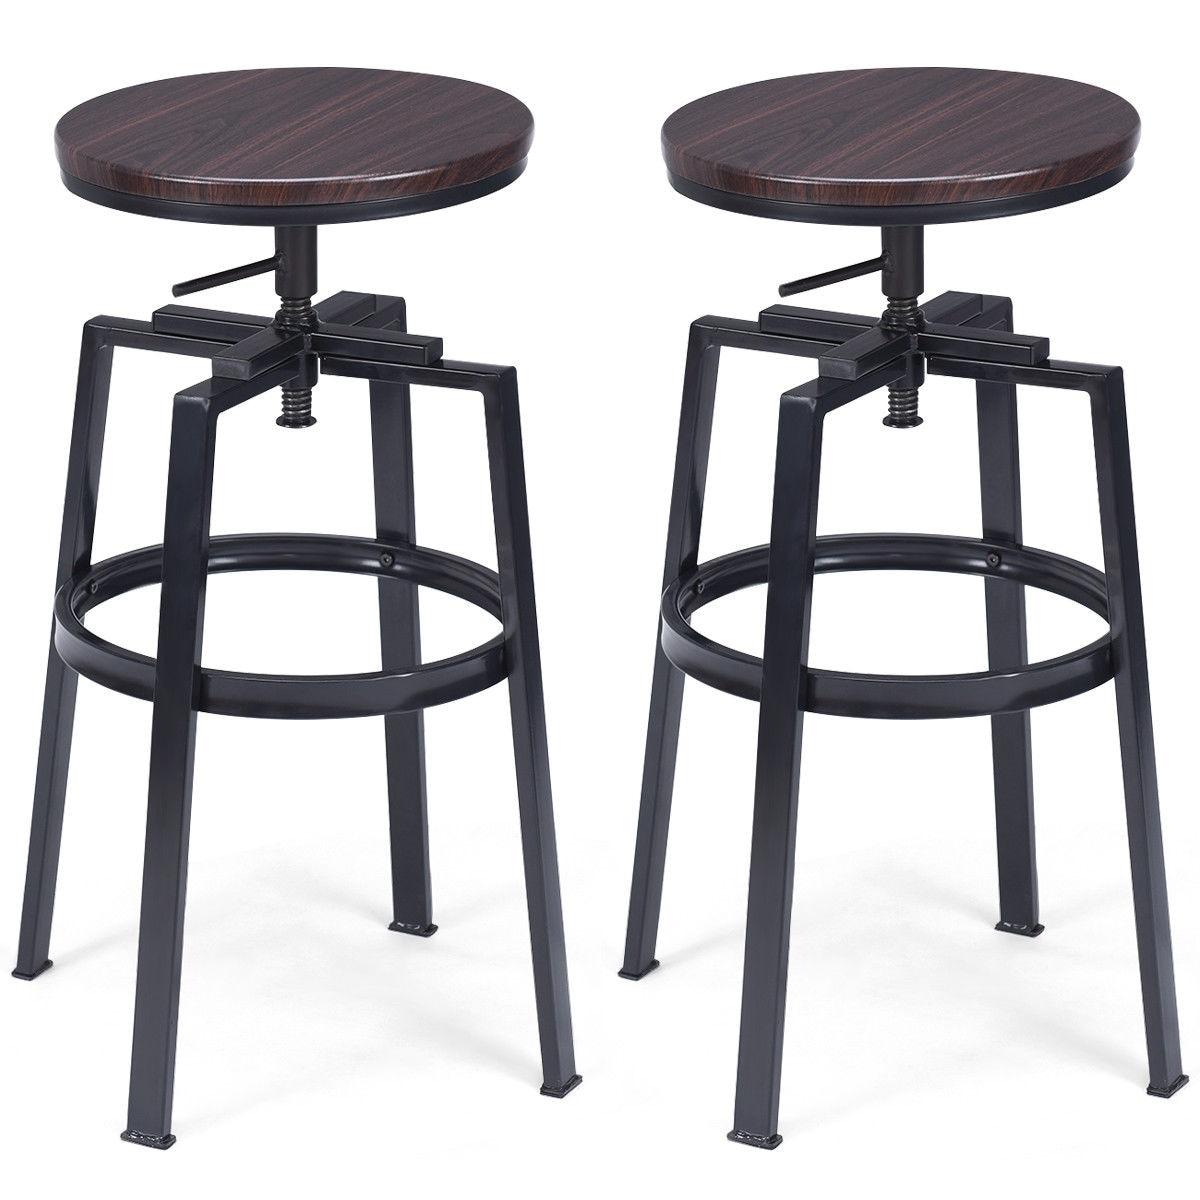 Pleasing Costway Set Of 2 Vintage Bar Stool Adjustable Wood Metal Design Pub Chairs Industrial Inzonedesignstudio Interior Chair Design Inzonedesignstudiocom